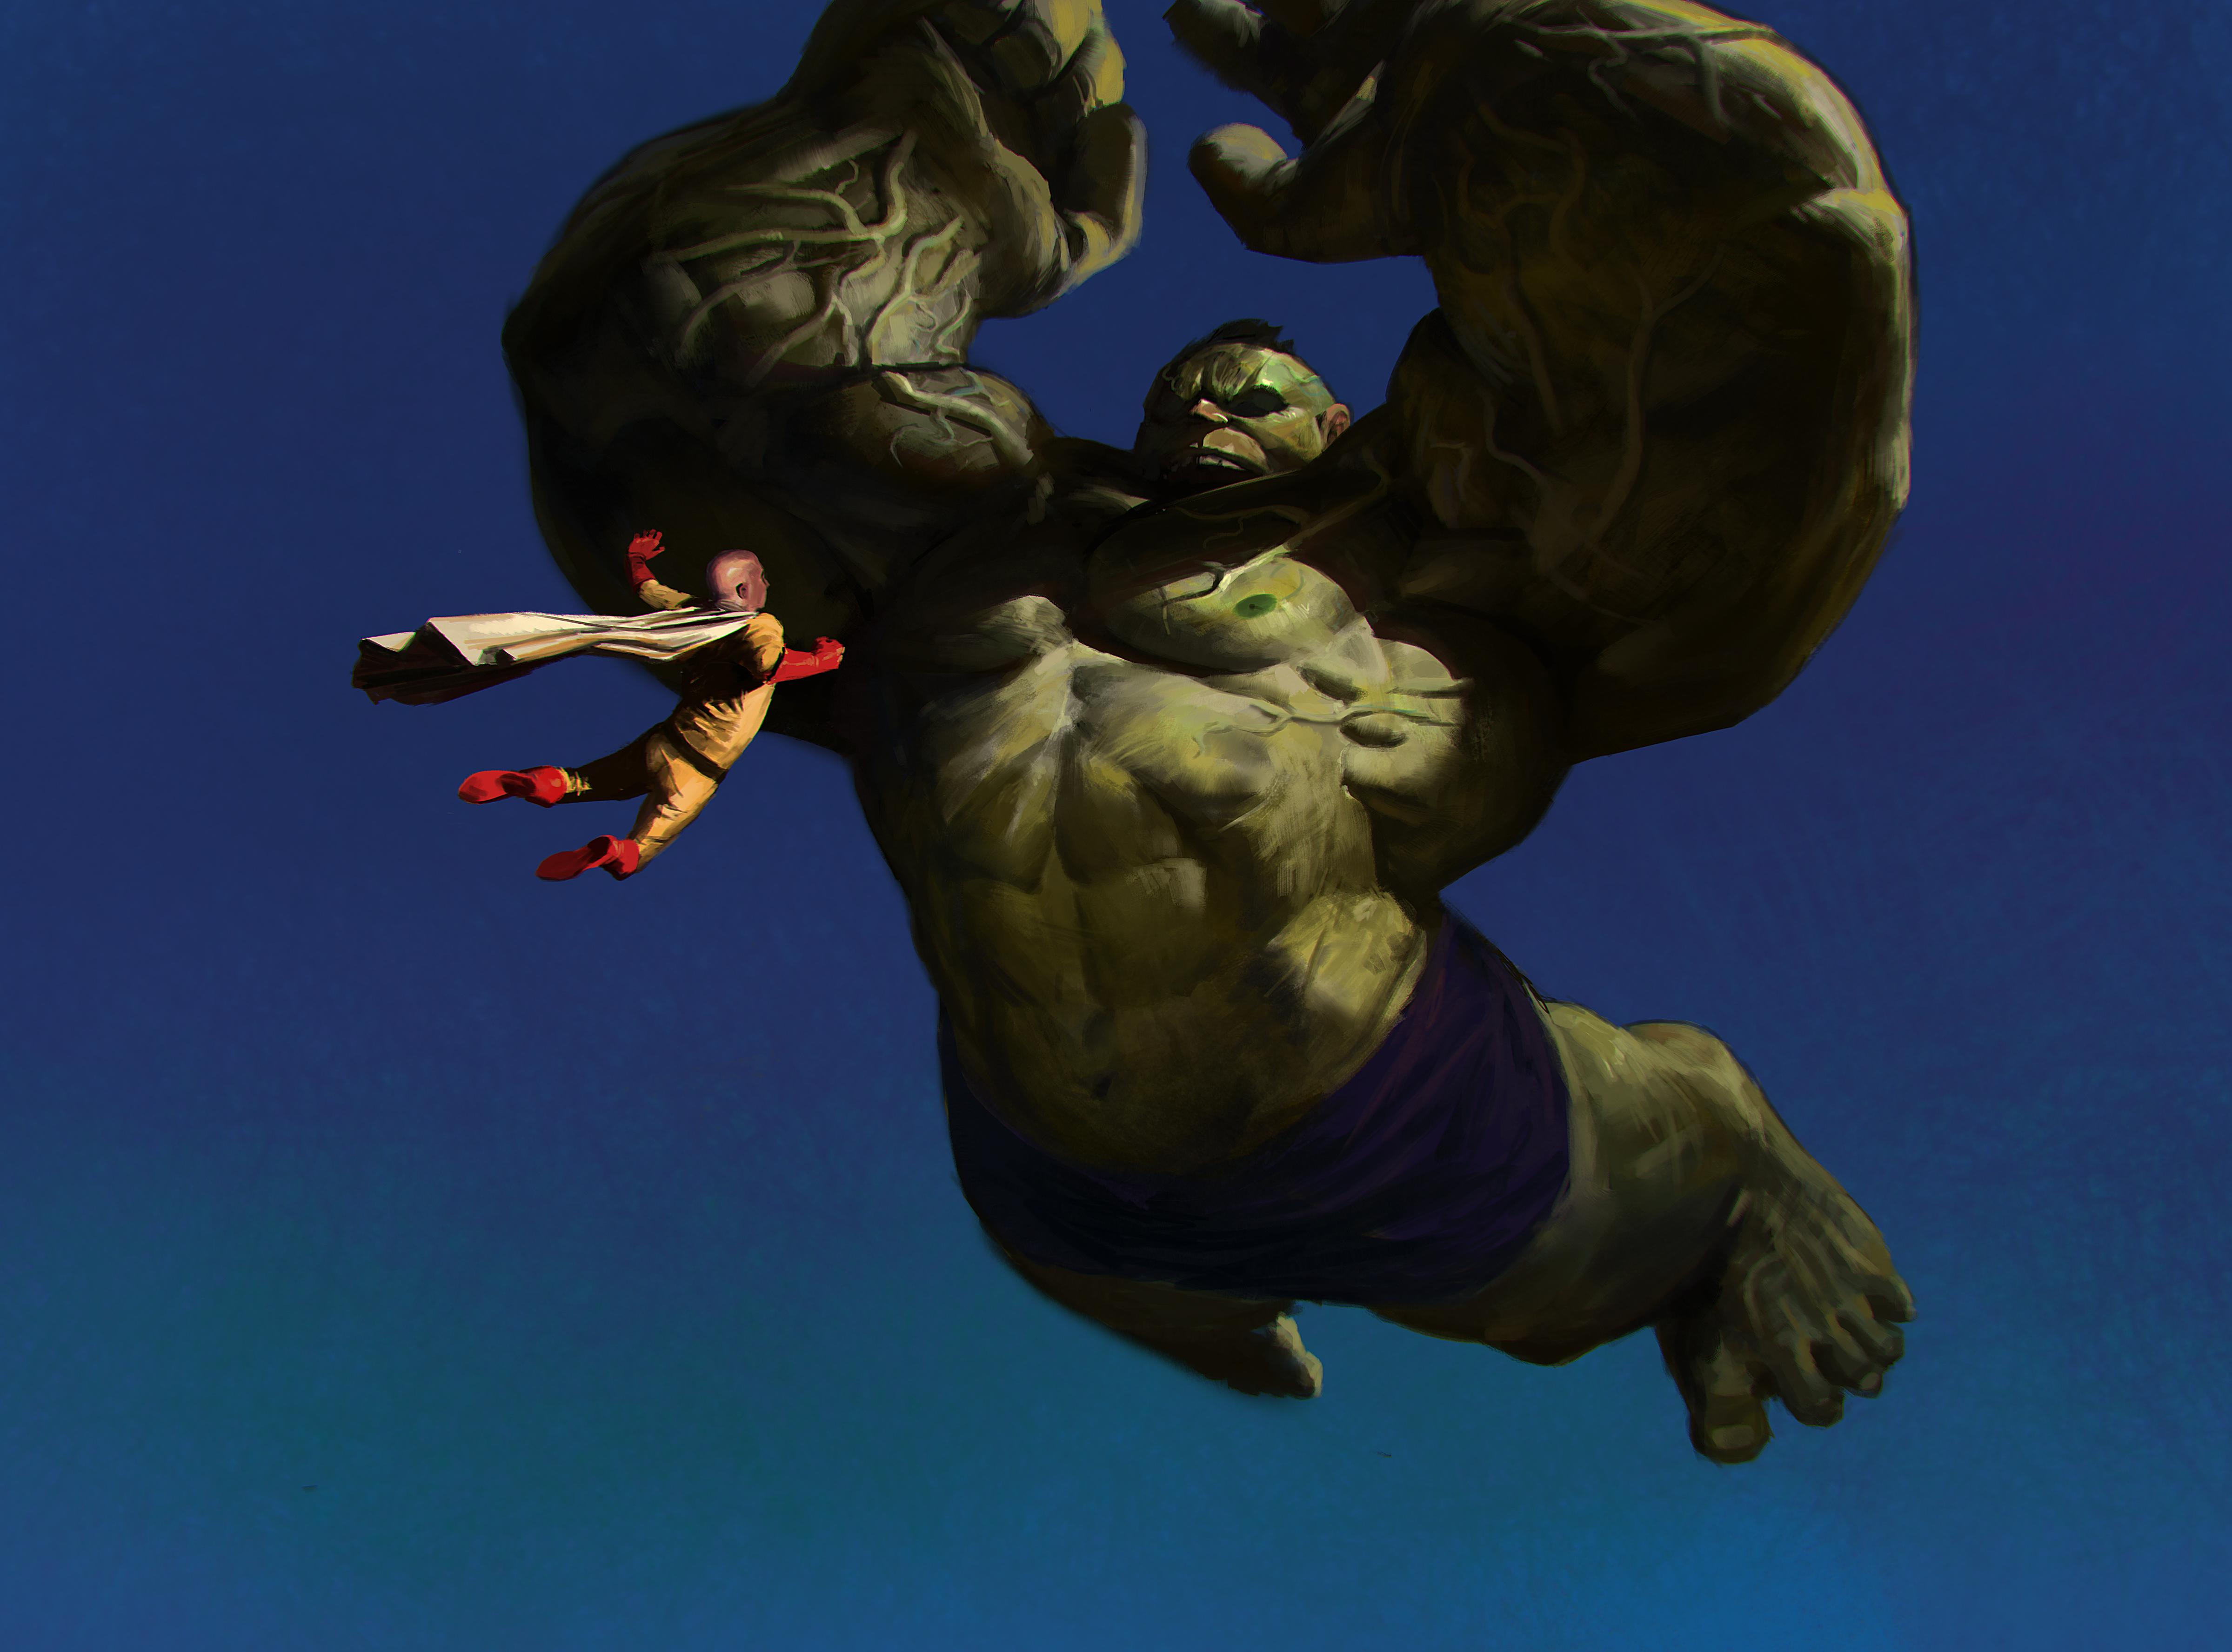 Saitama Vs Hulk Hd Anime 4k Wallpapers Images Backgrounds